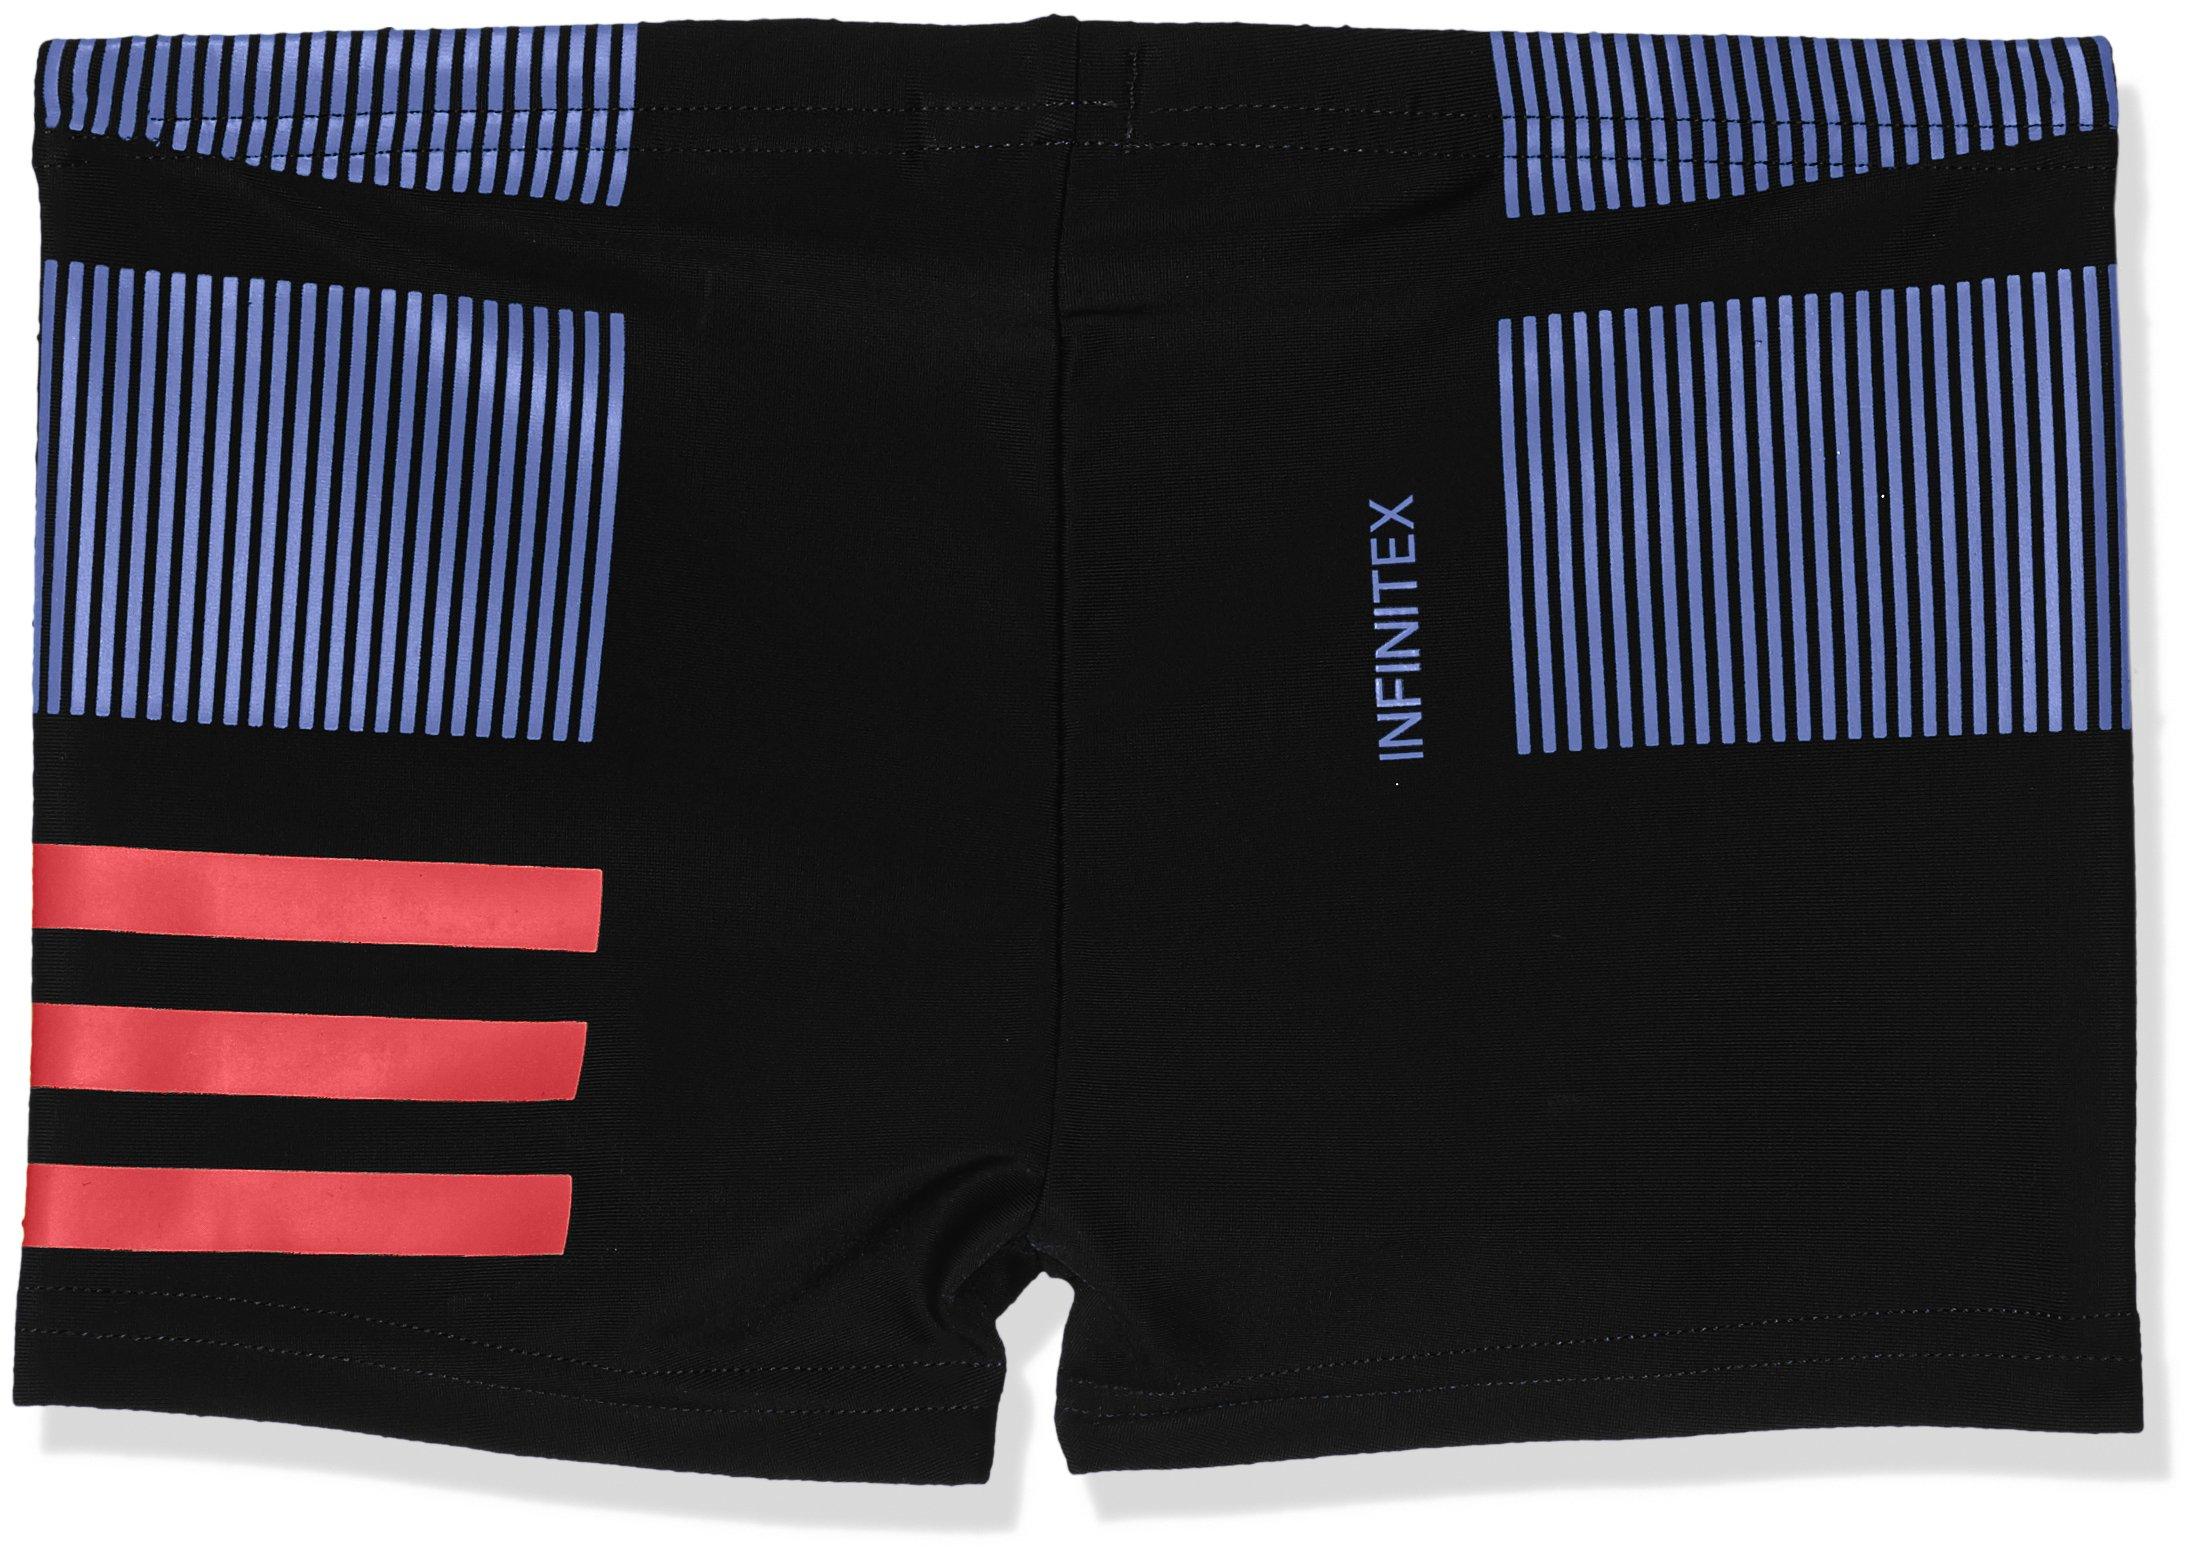 81lRt0XiZZL - adidas Infinitex III Colorblock Boxer